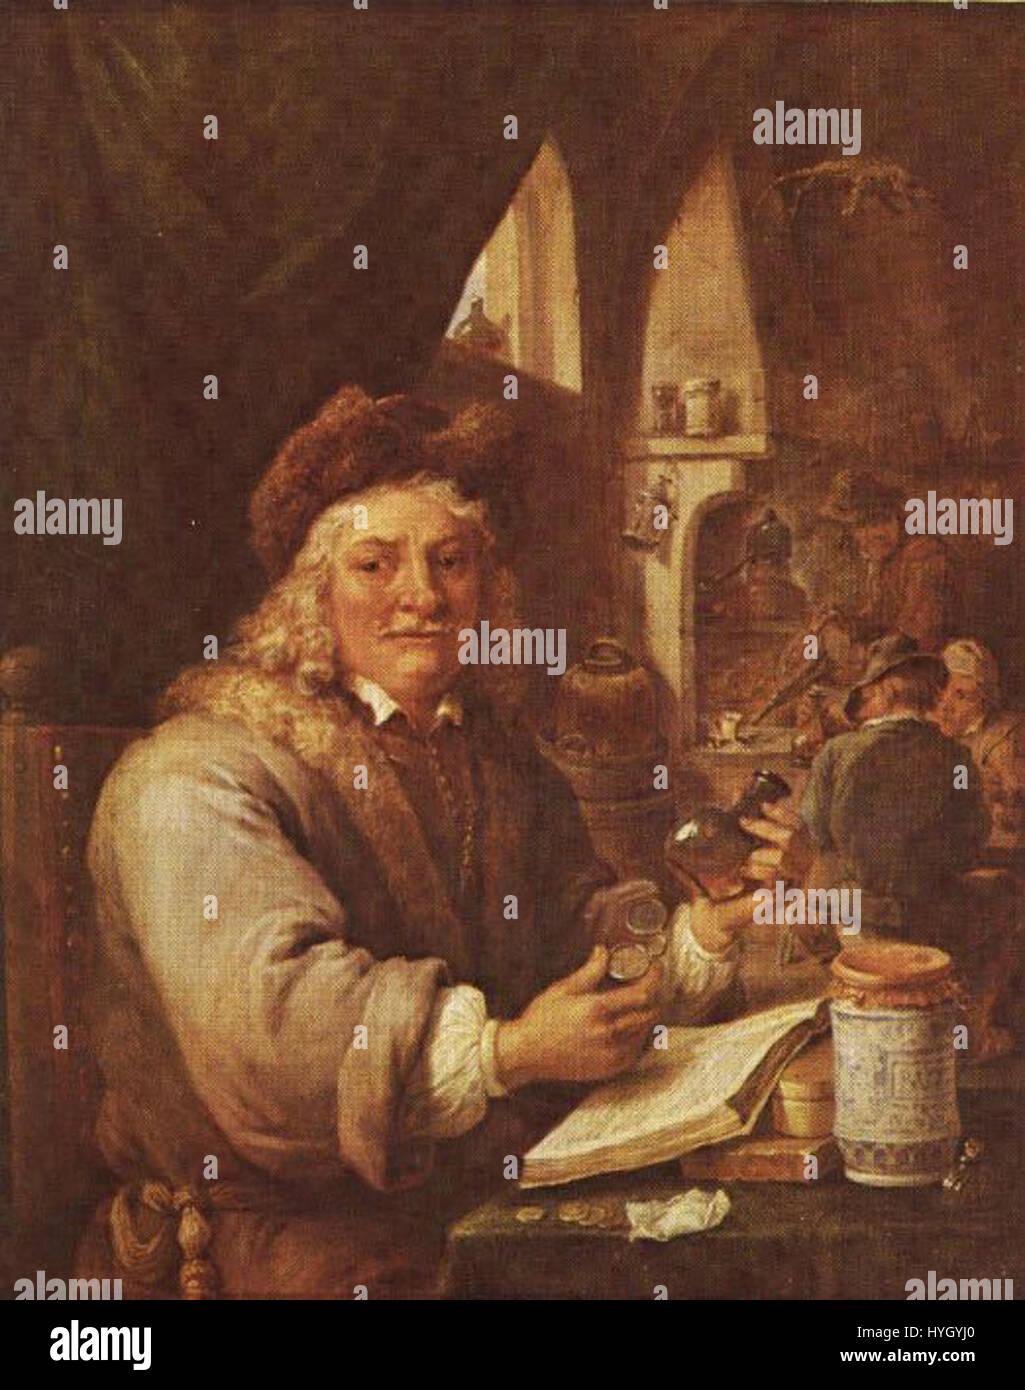 David Teniers the Younger   Self portrait as an alchemist - Stock Image